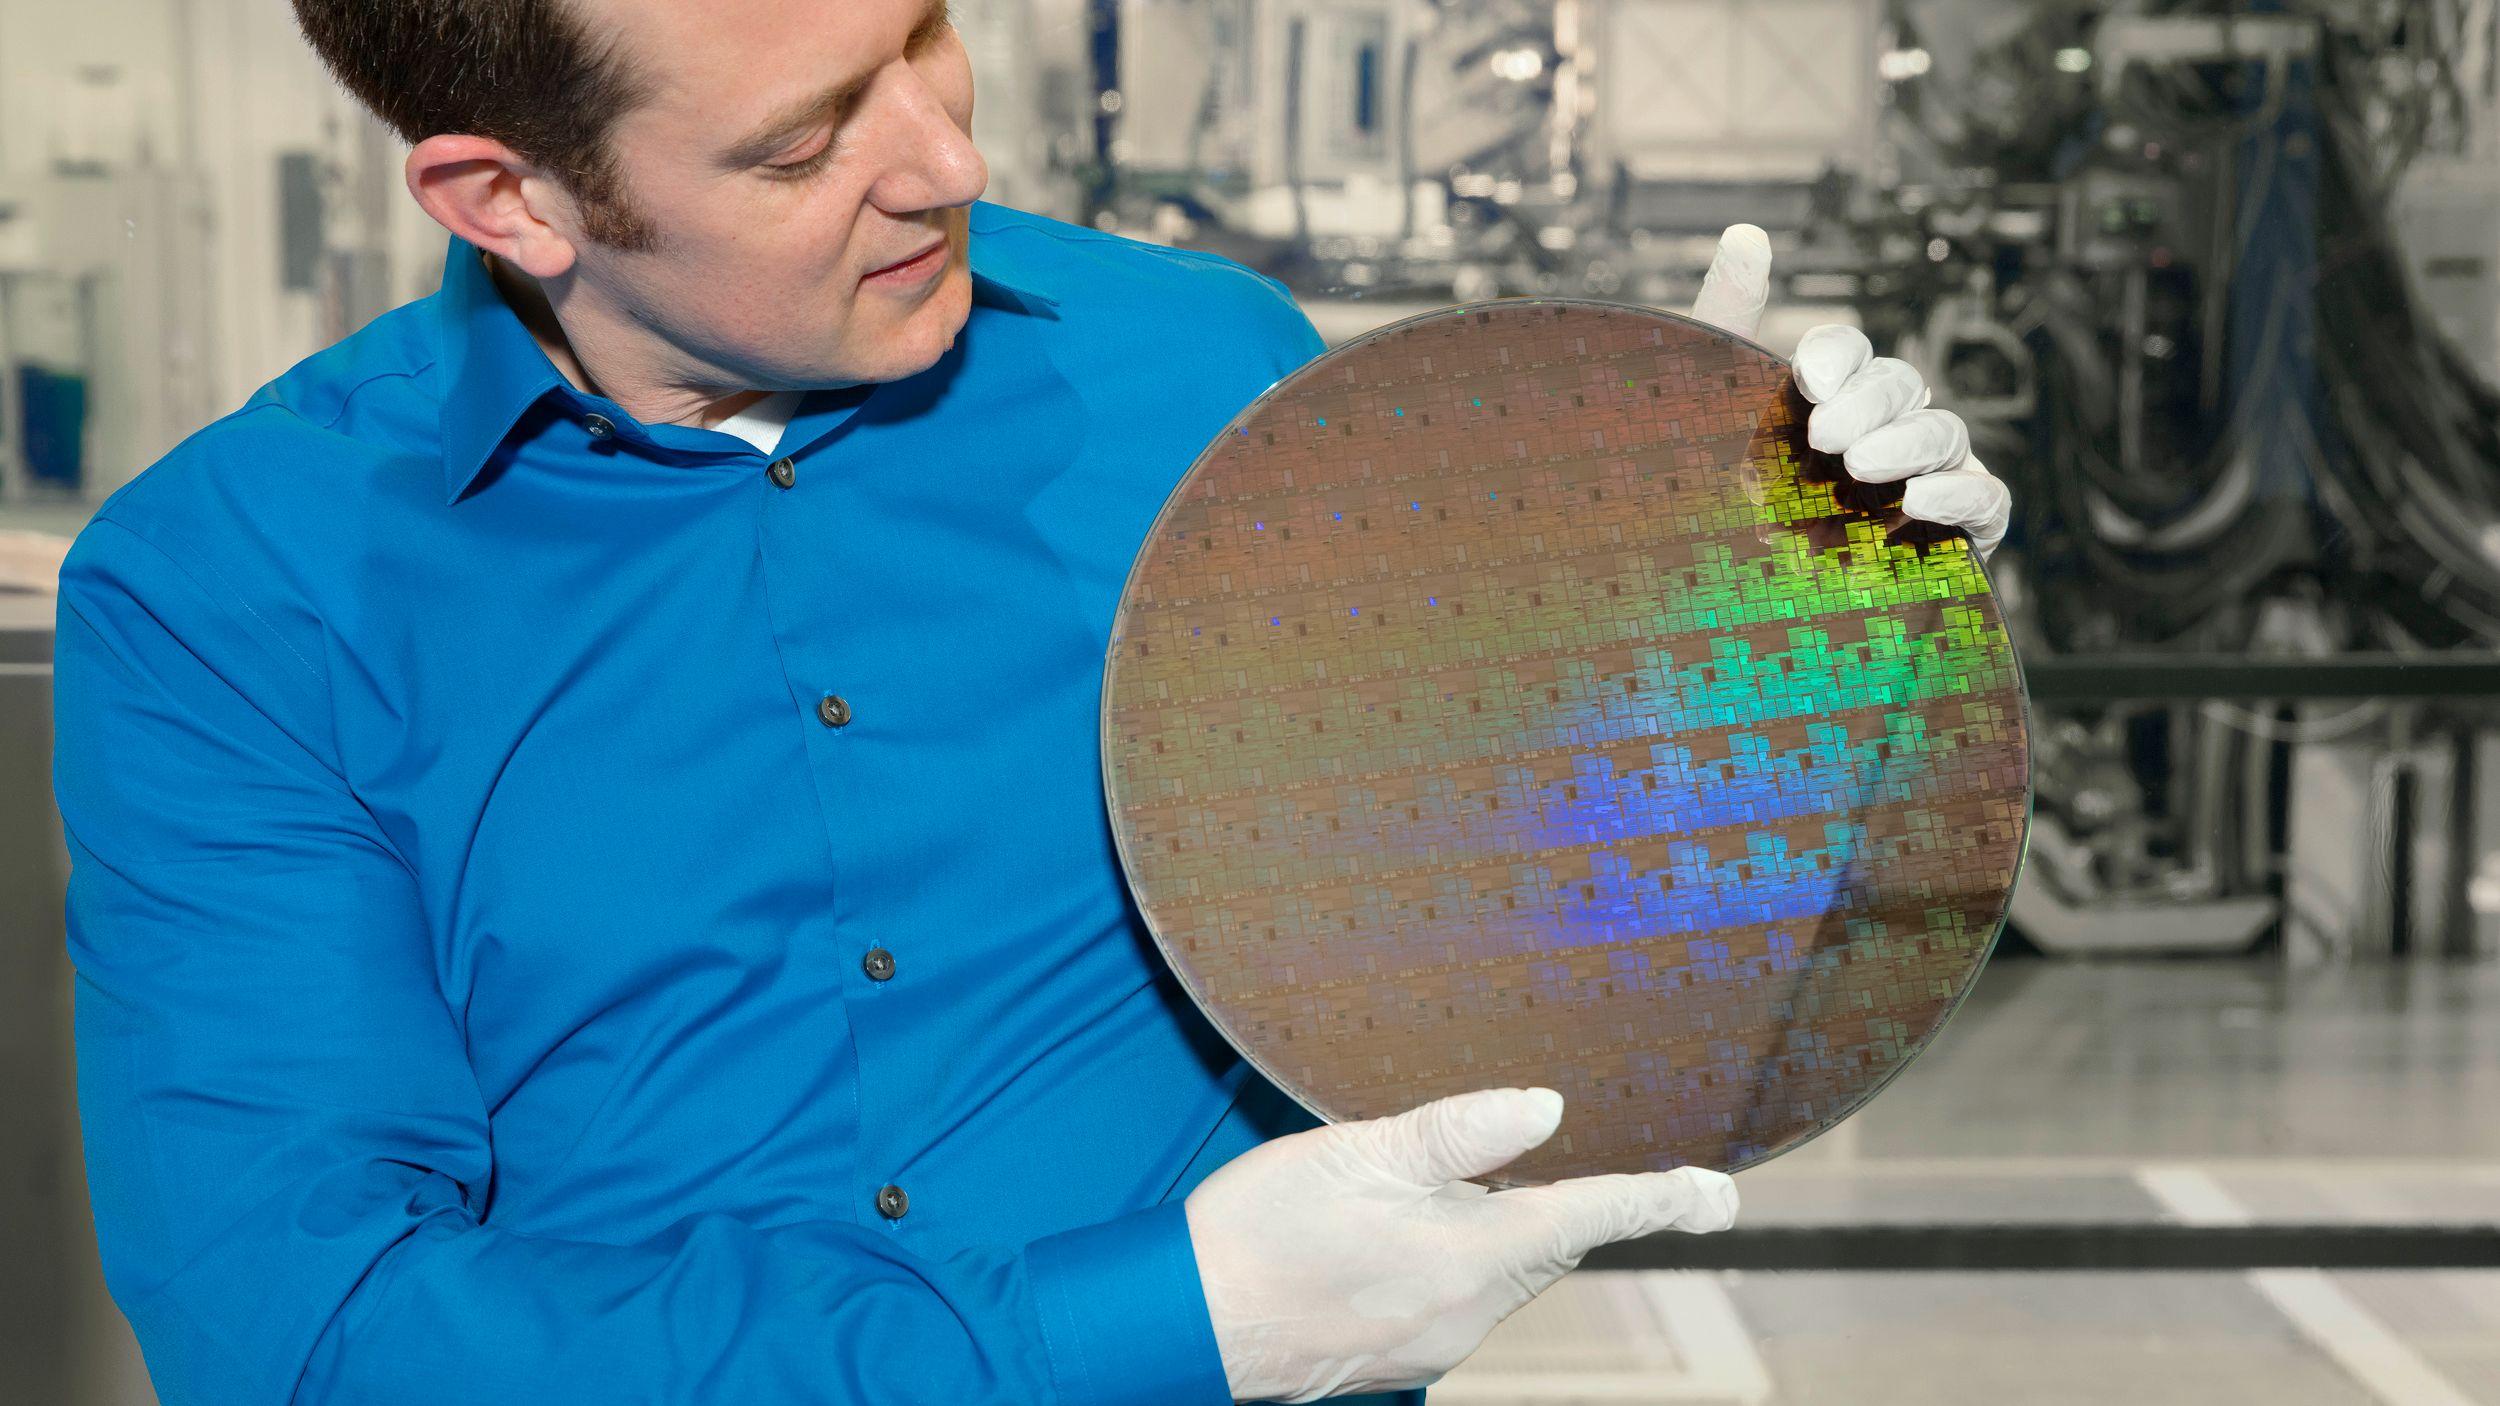 IBM krymper prosessorteknologien helt ned til 5 nanometer